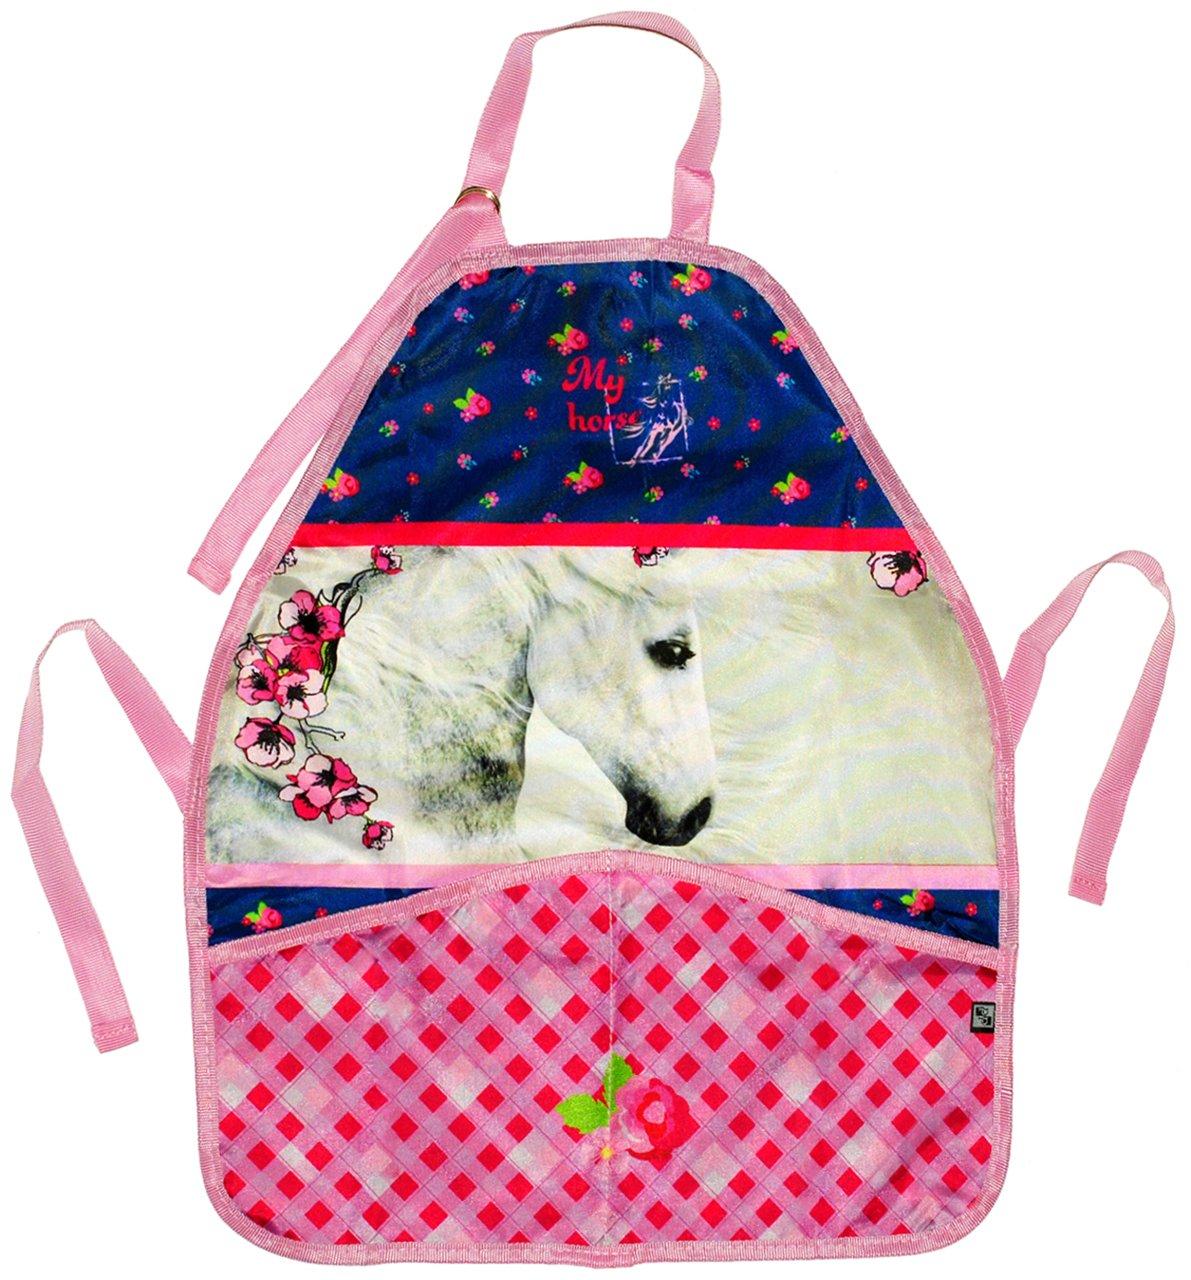 Kinderschü rze - ' Pferd / Romantic Horse ' - grö ß enverstellbar mit 2 Taschen - Schü rze / beschichtet - fü r Mä dchen & Jungen - Kinder - Backschü rze / Bastelschü rze / Gartenschü rze - malen kneten kochen